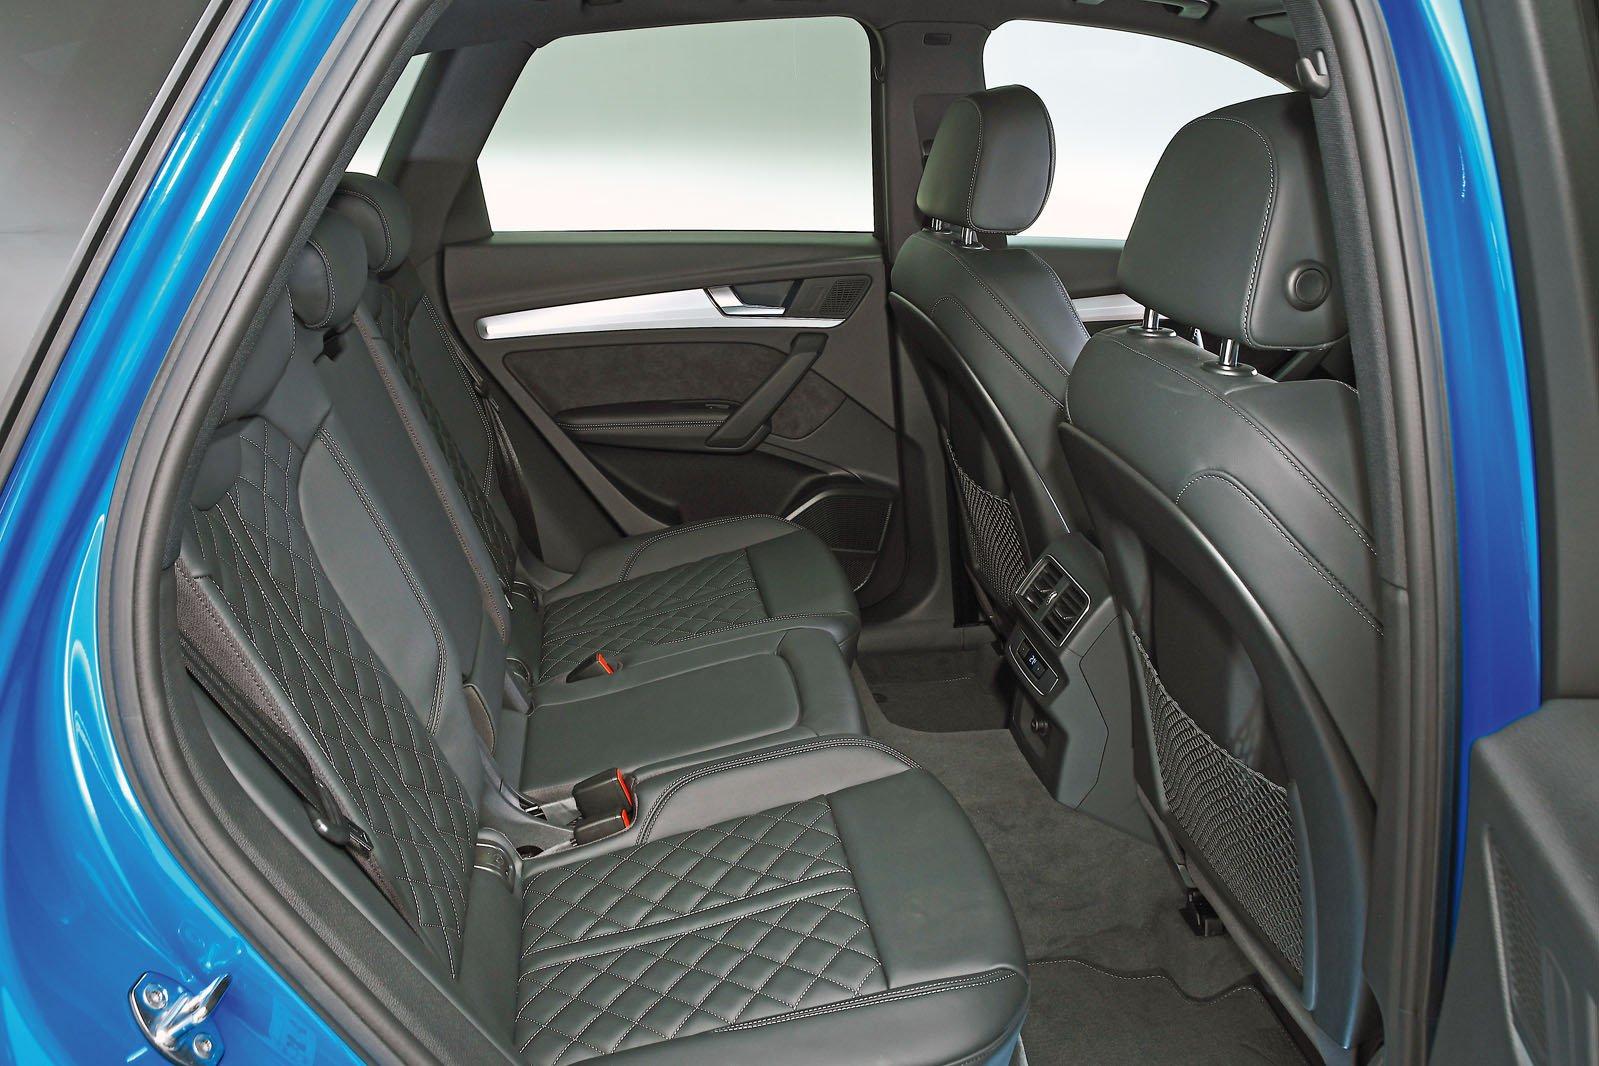 Audi Q5 rear space